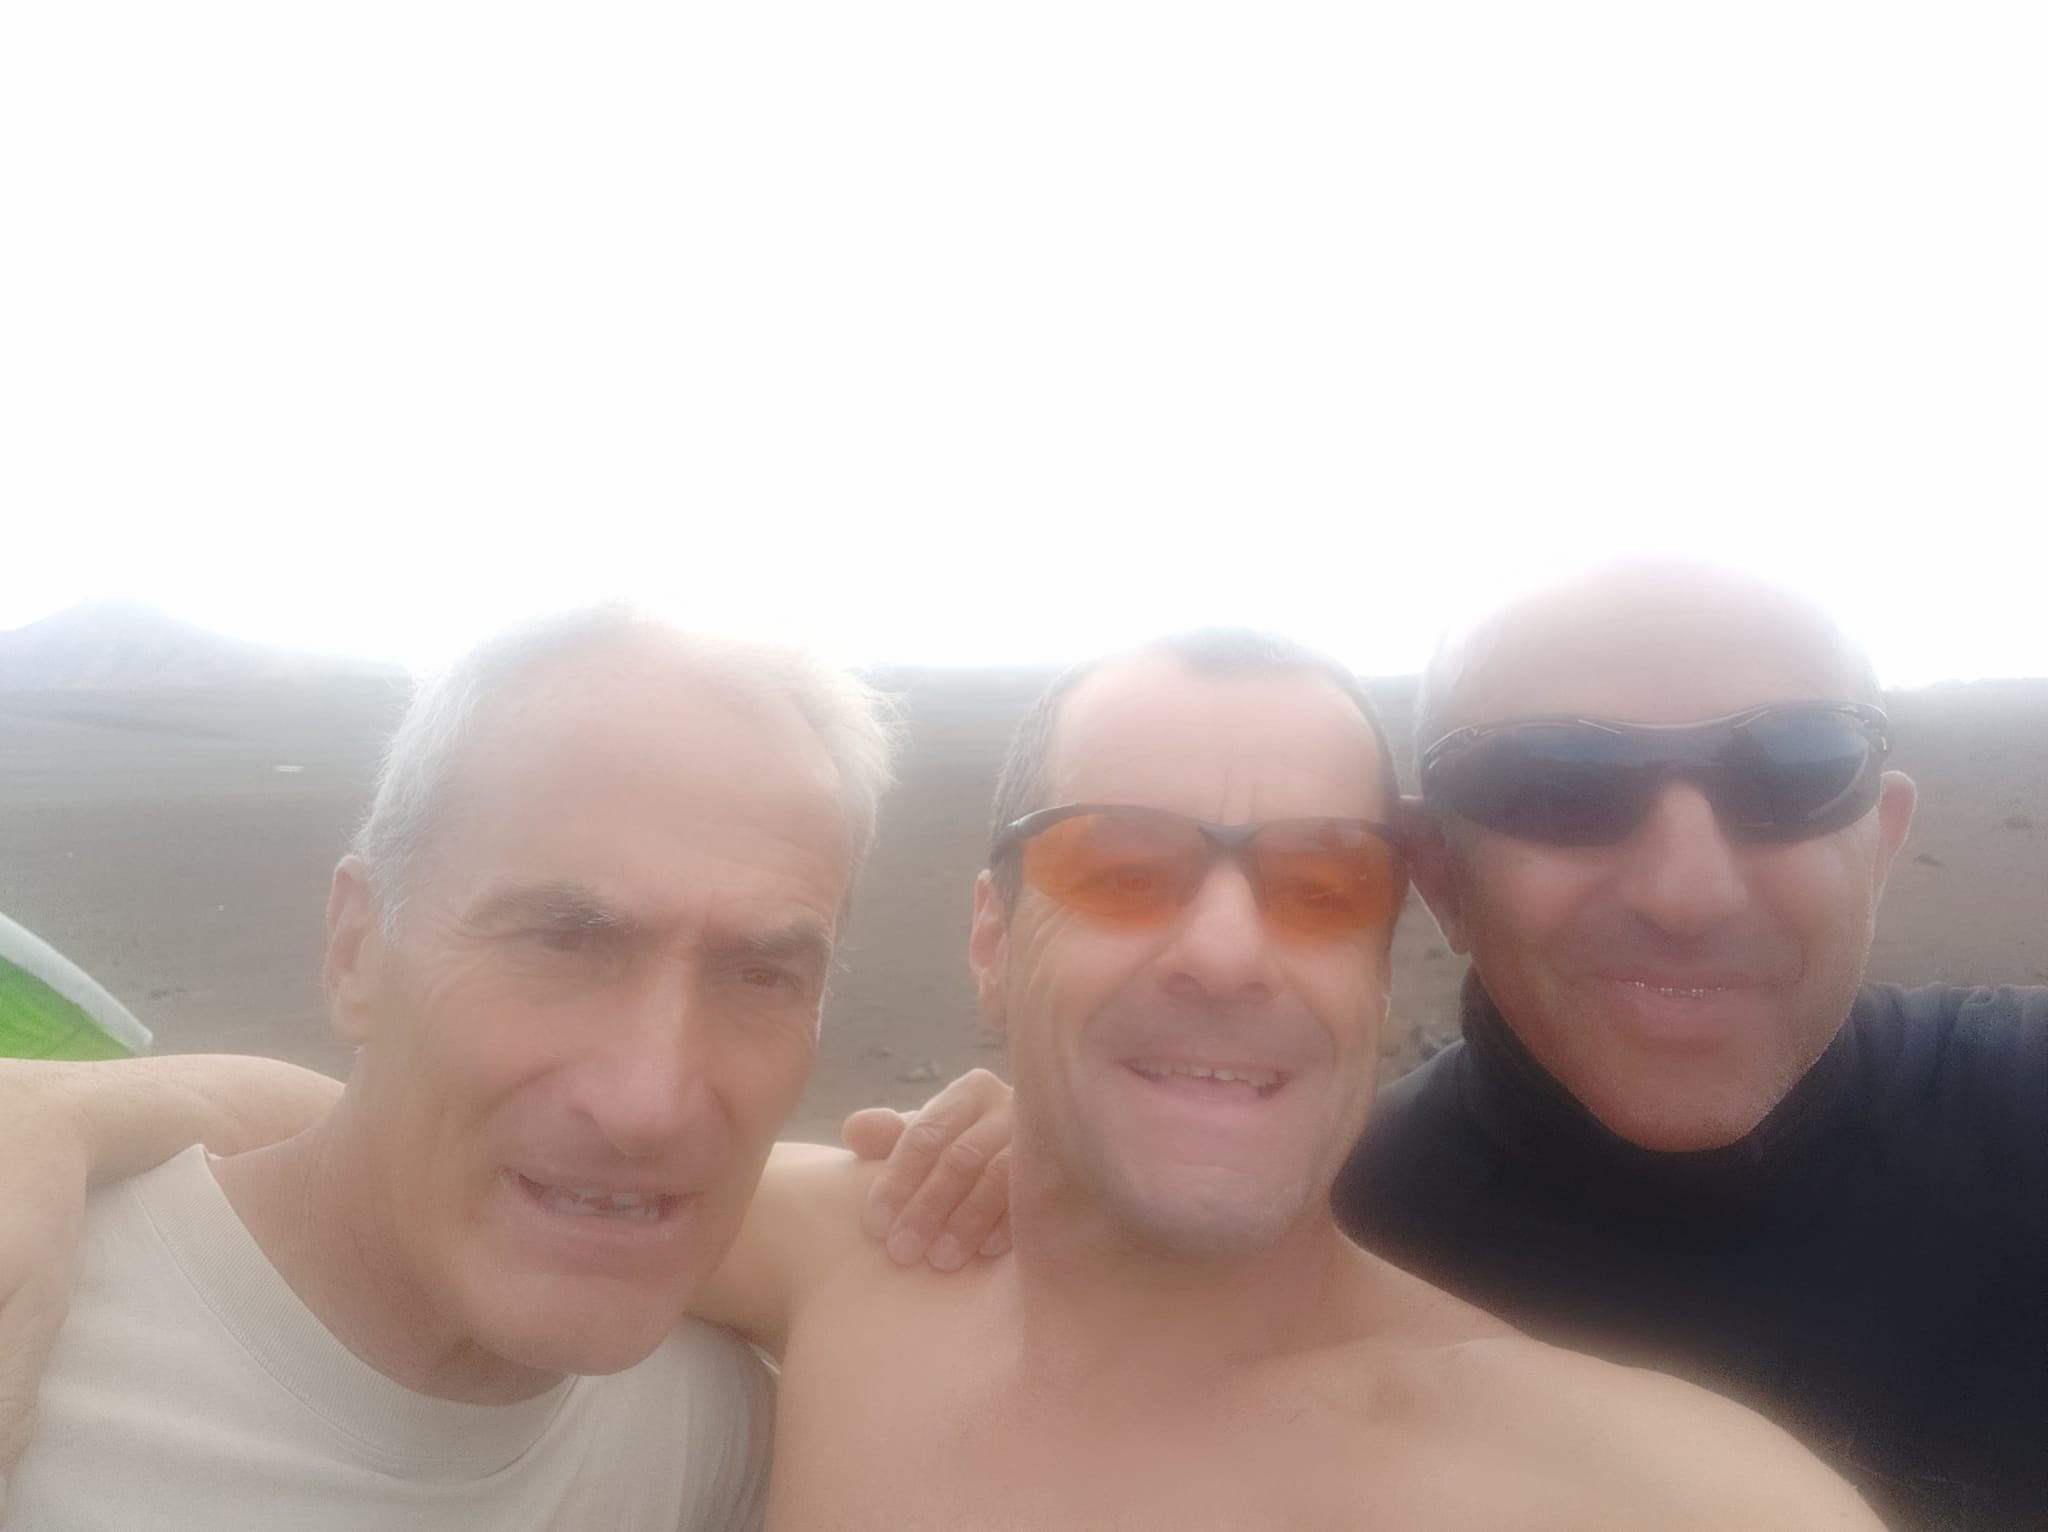 Gol Carlos, Tximo, Benito